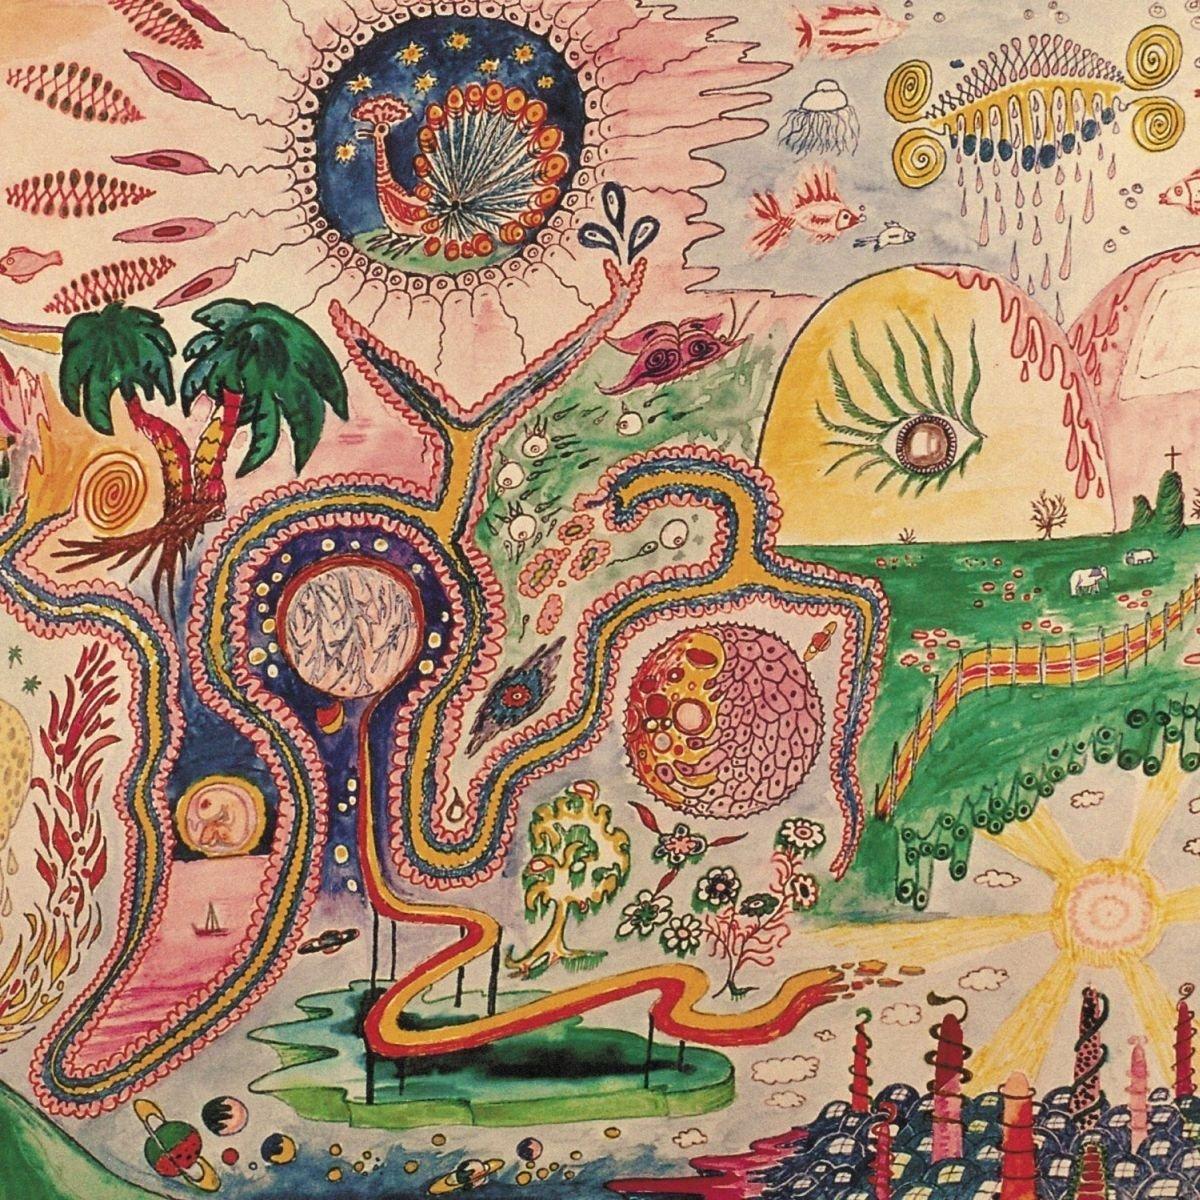 CD : Youth Lagoon - Wondrous Bughouse (CD)